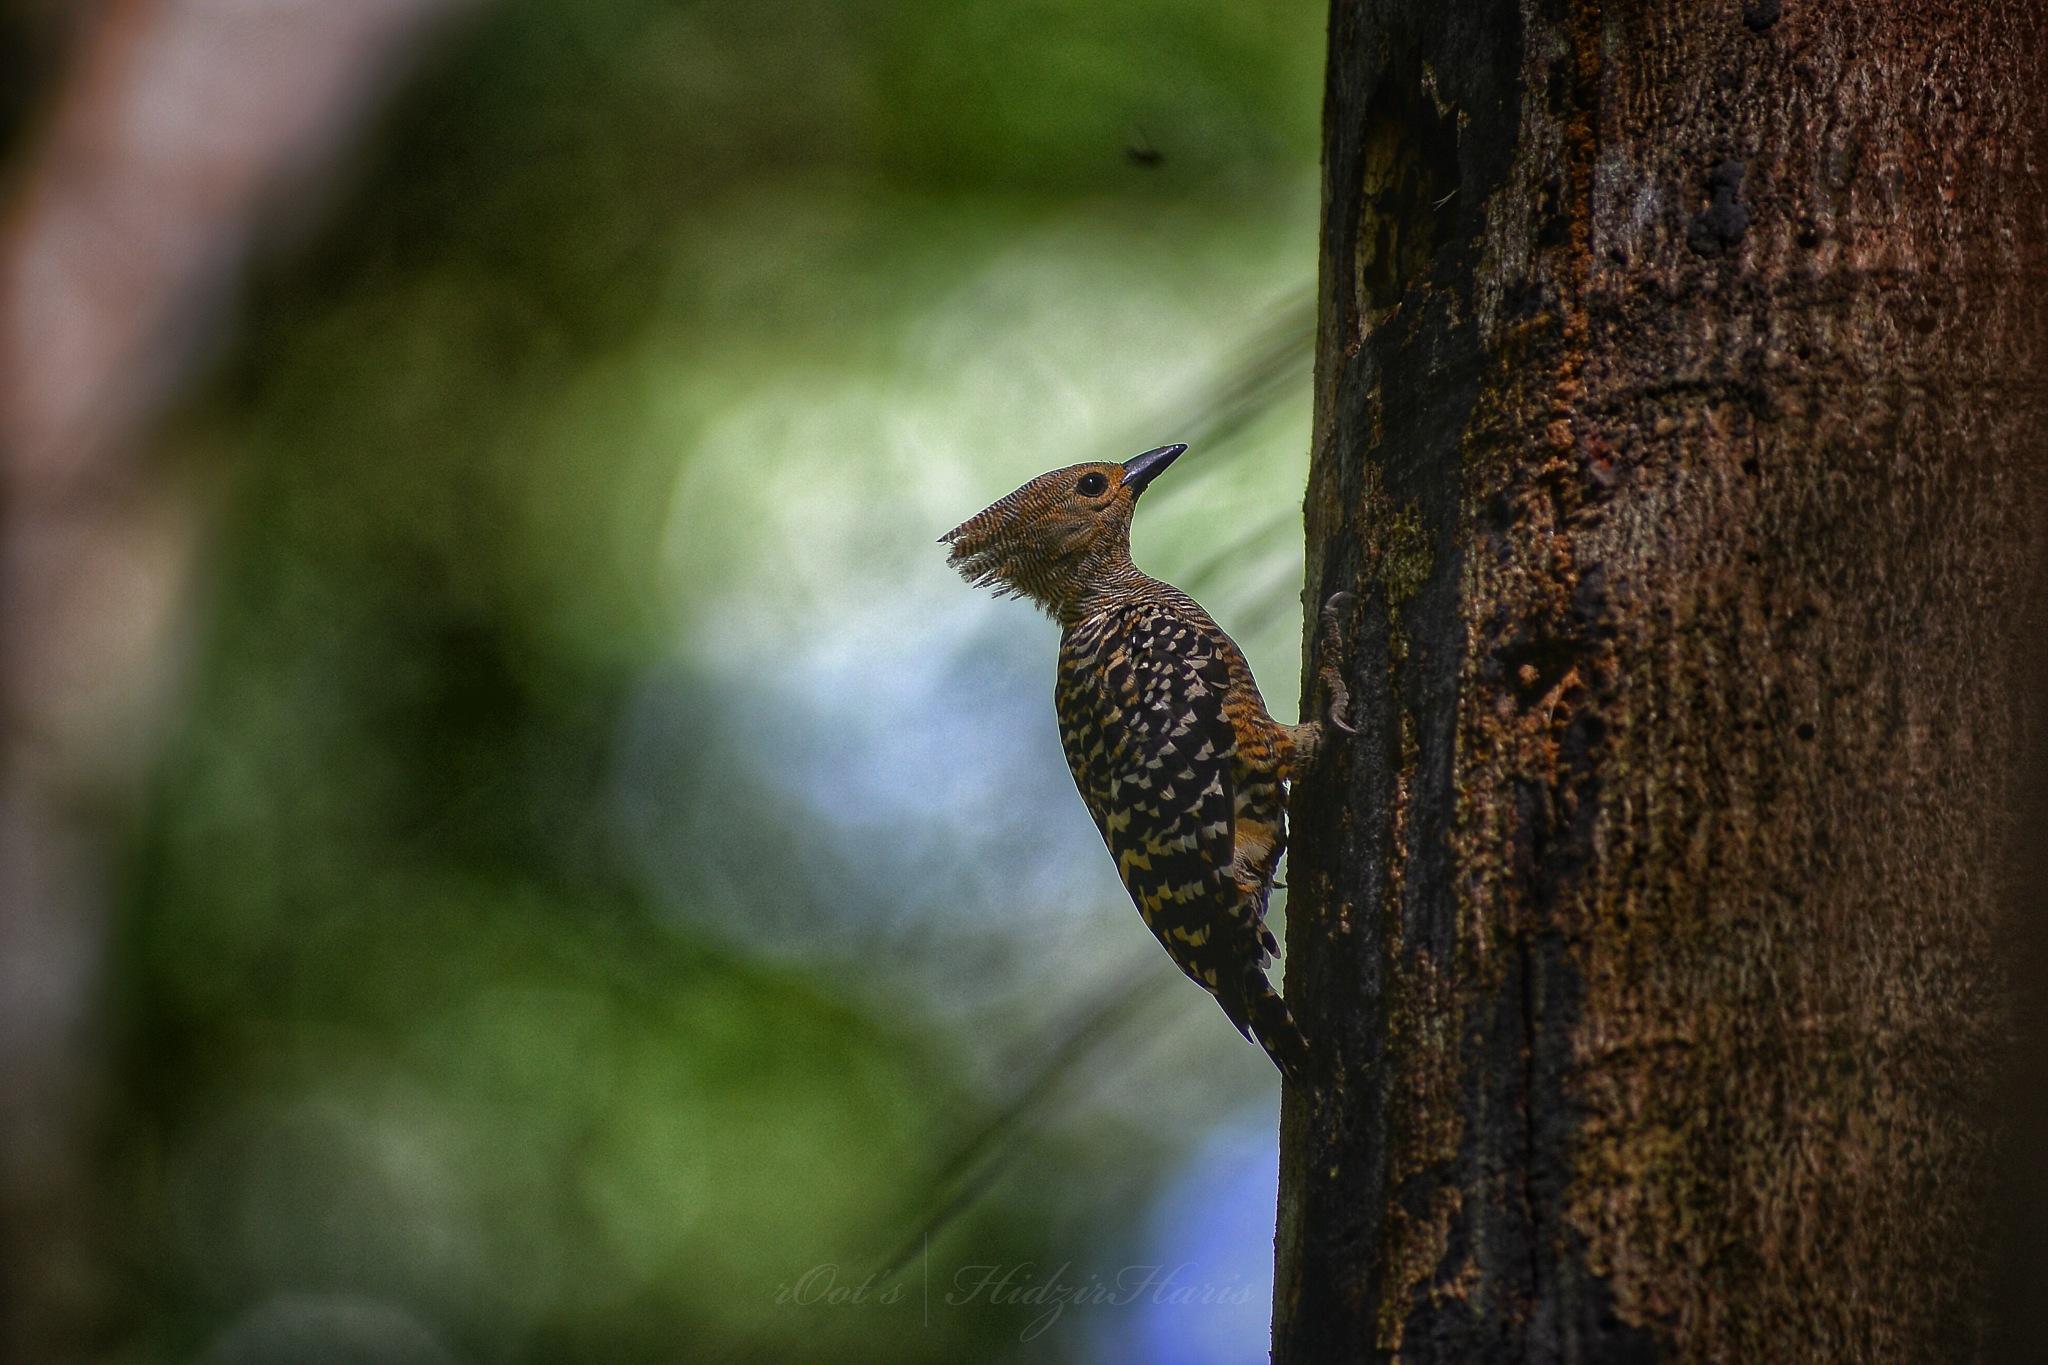 Buff-rumped woodpecker~ Meiglyptes tristis (Female)  by HidzirHaris